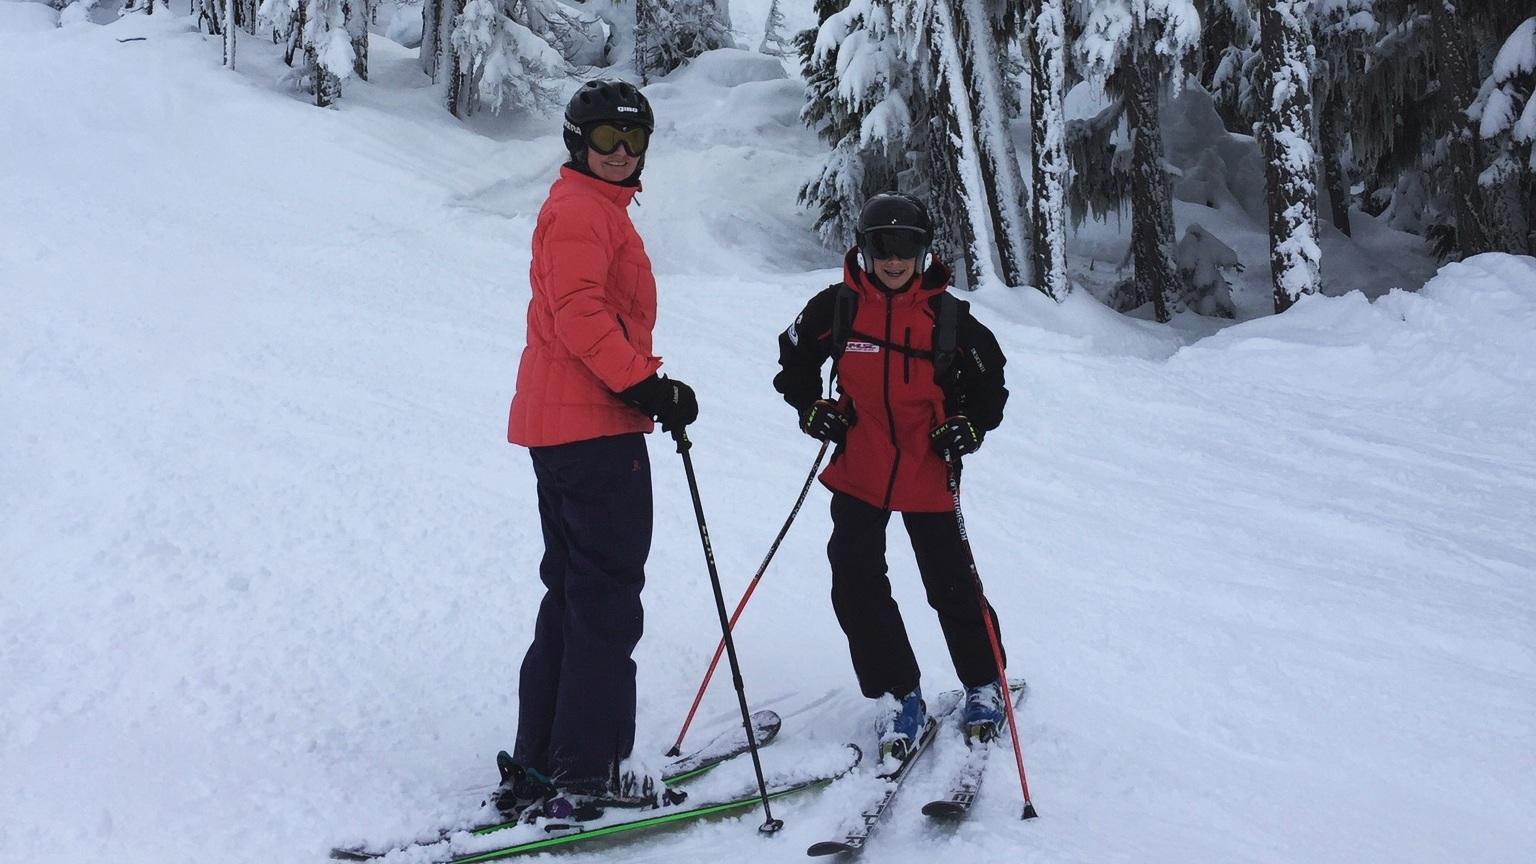 Skiing%2BShot%2BST%2B%2526%2BSam.jpg